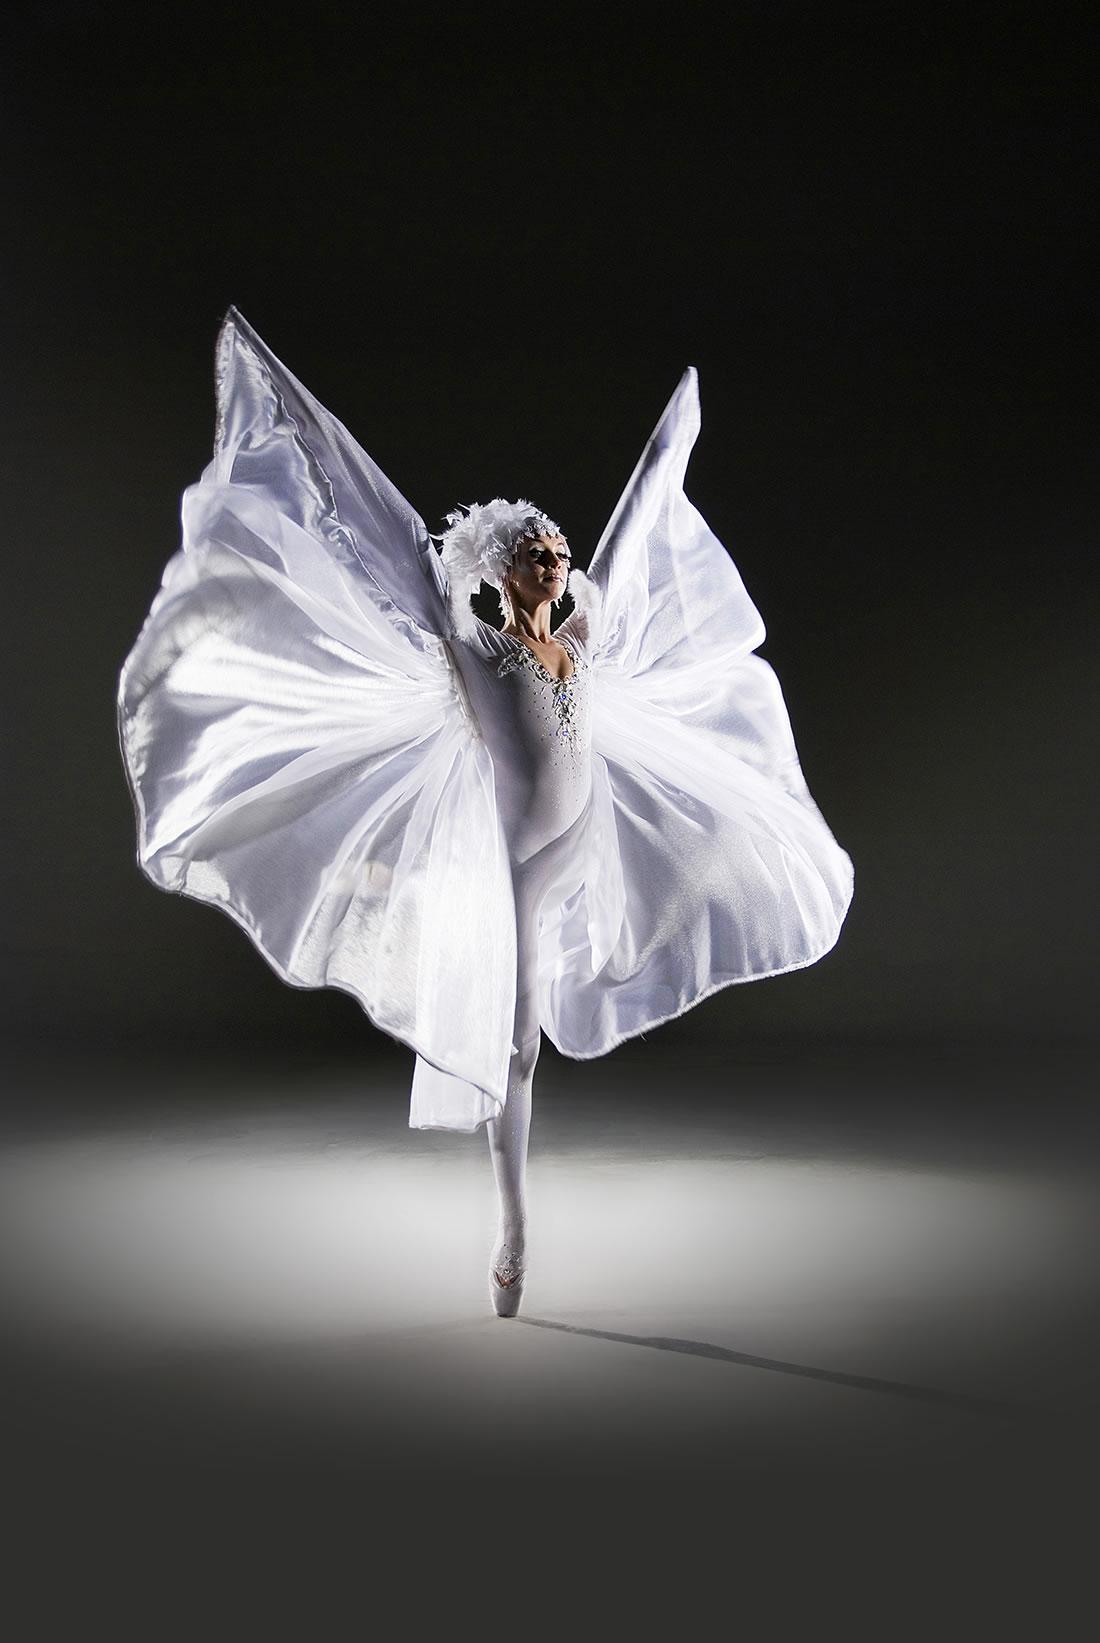 Groundbased Shows - Ballerinas Hero - Crystalline 2